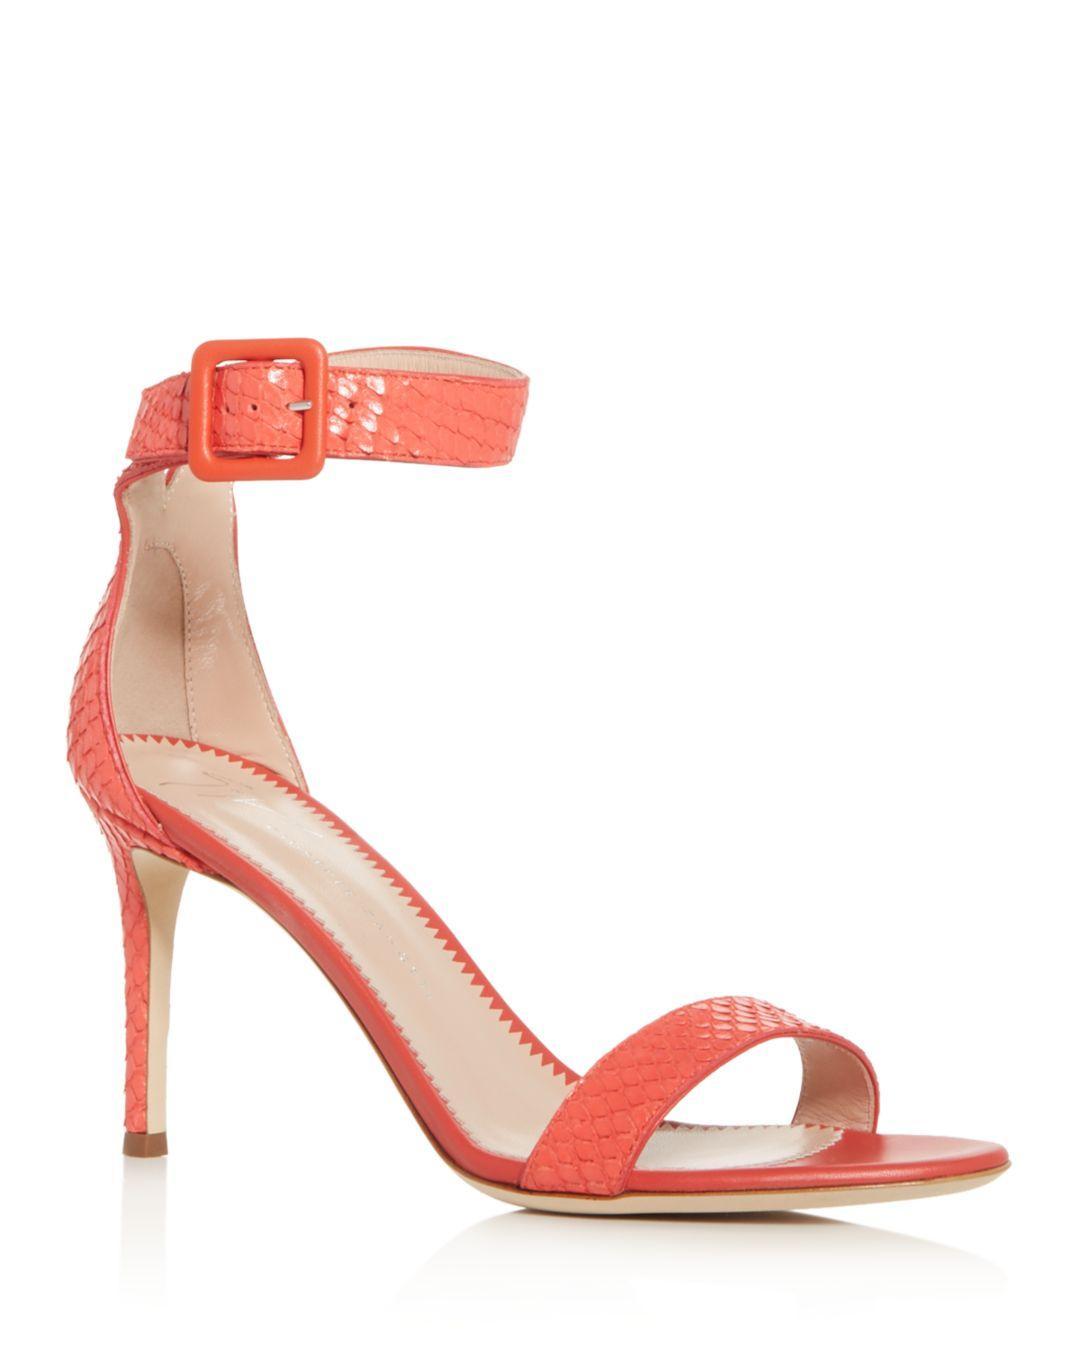 4a074132235 Lyst - Giuseppe Zanotti Women s Neyla Ankle-strap High-heel Sandals